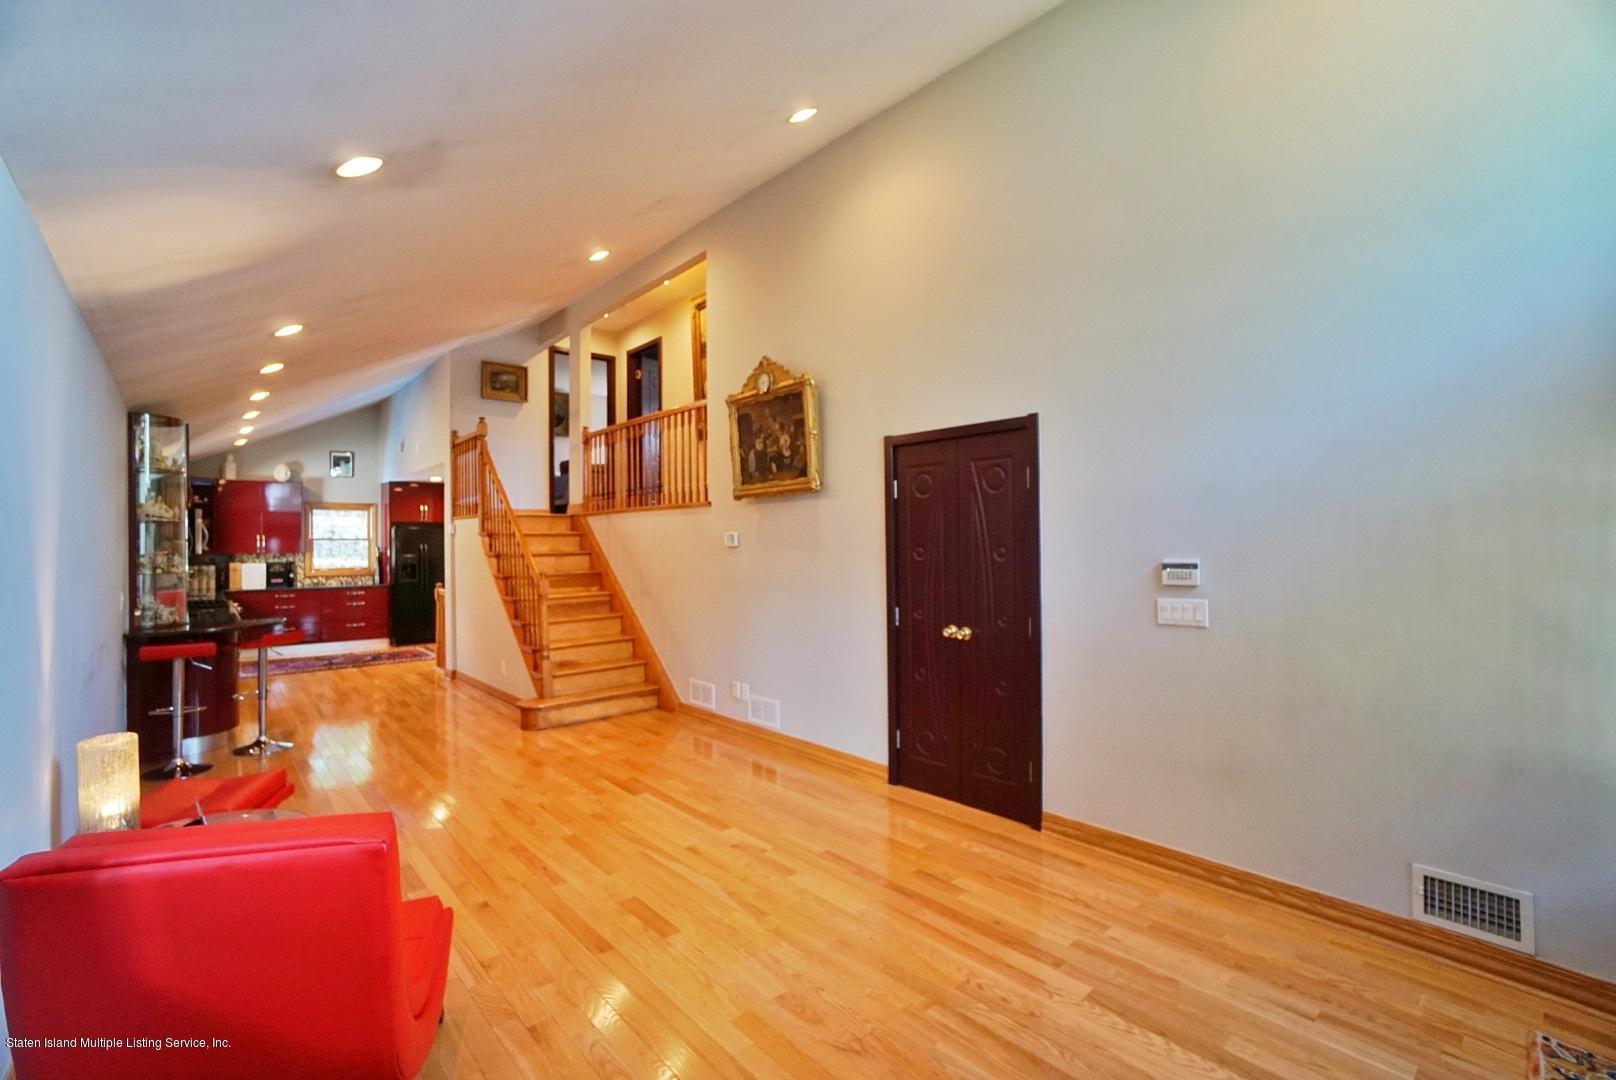 Single Family - Detached 48 Ocean Terrace  Staten Island, NY 10314, MLS-1130826-11